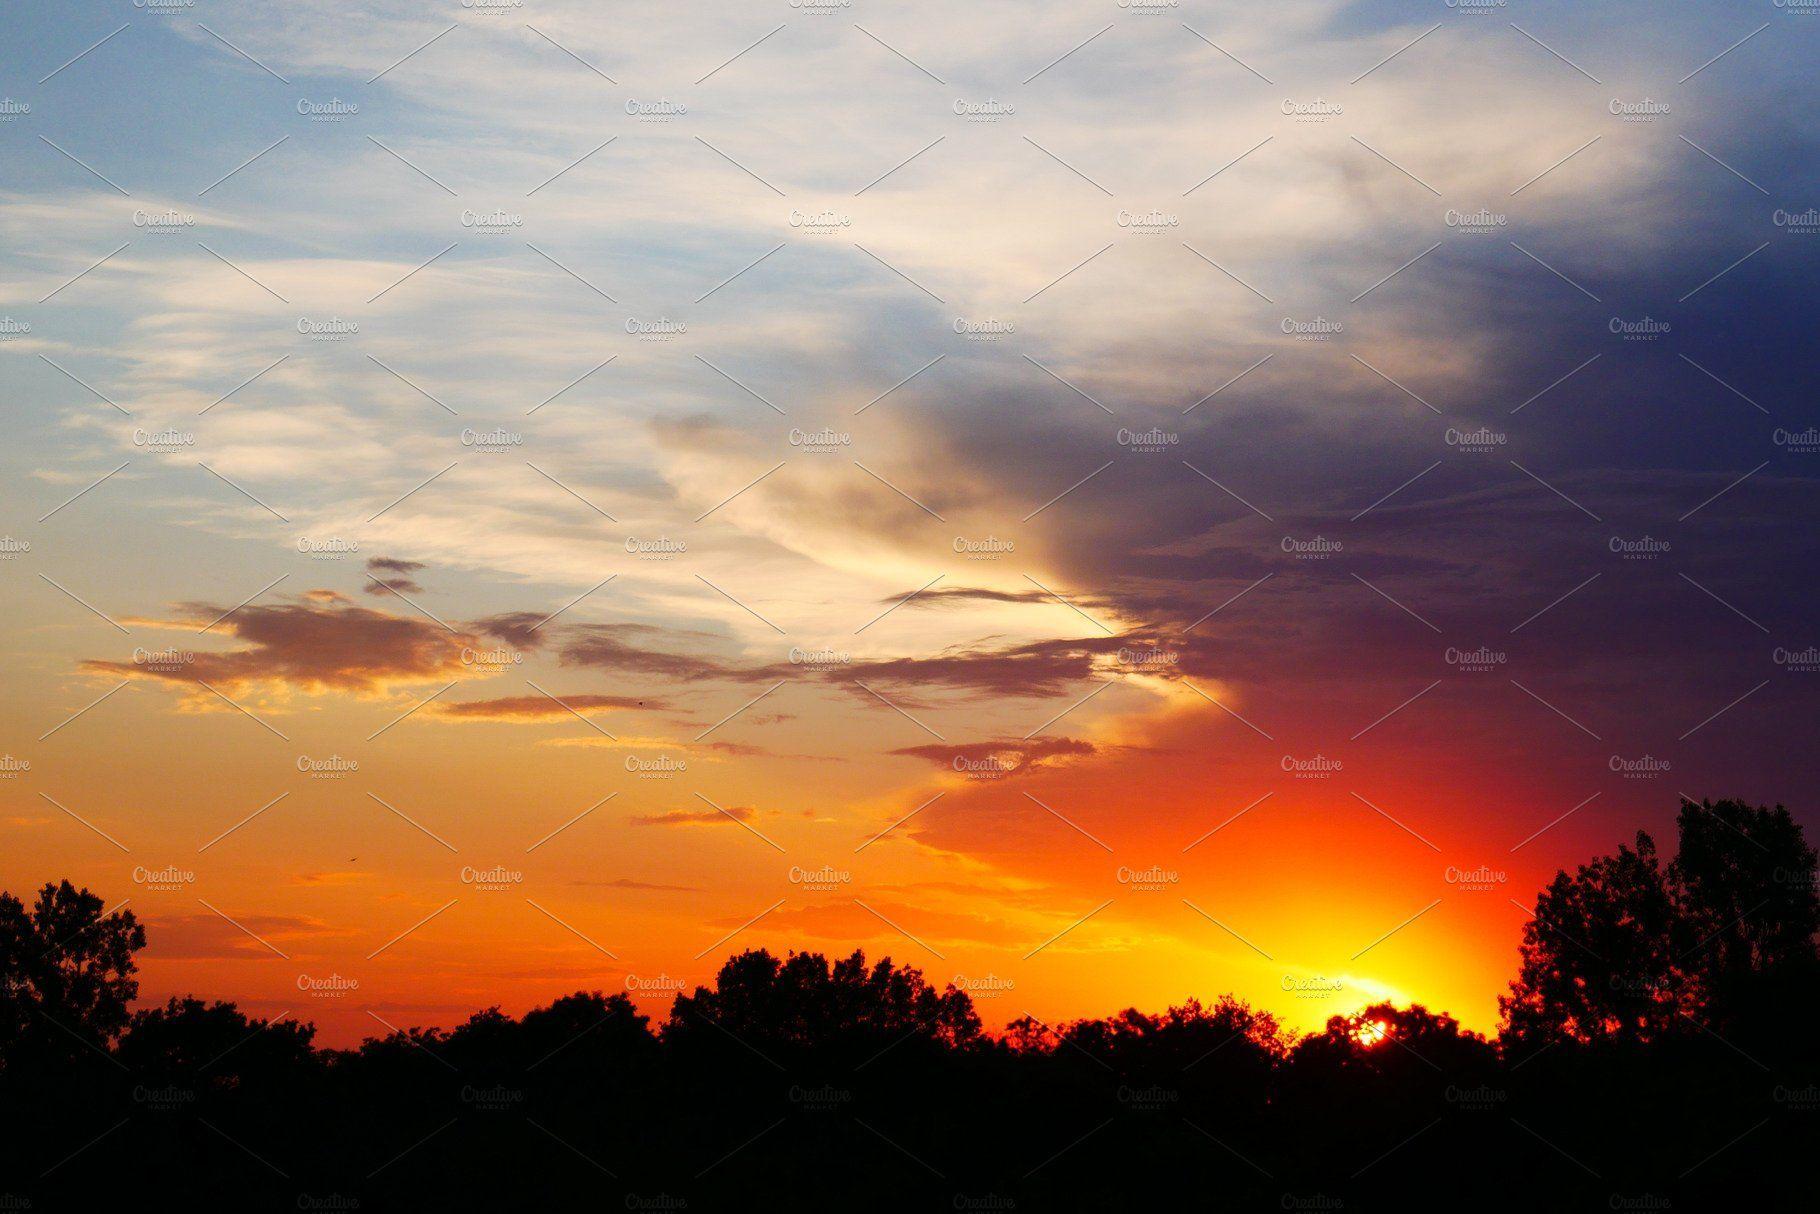 Colorful Sunset In 2020 Scenery Background Sunset Landscape Landscape Scenery